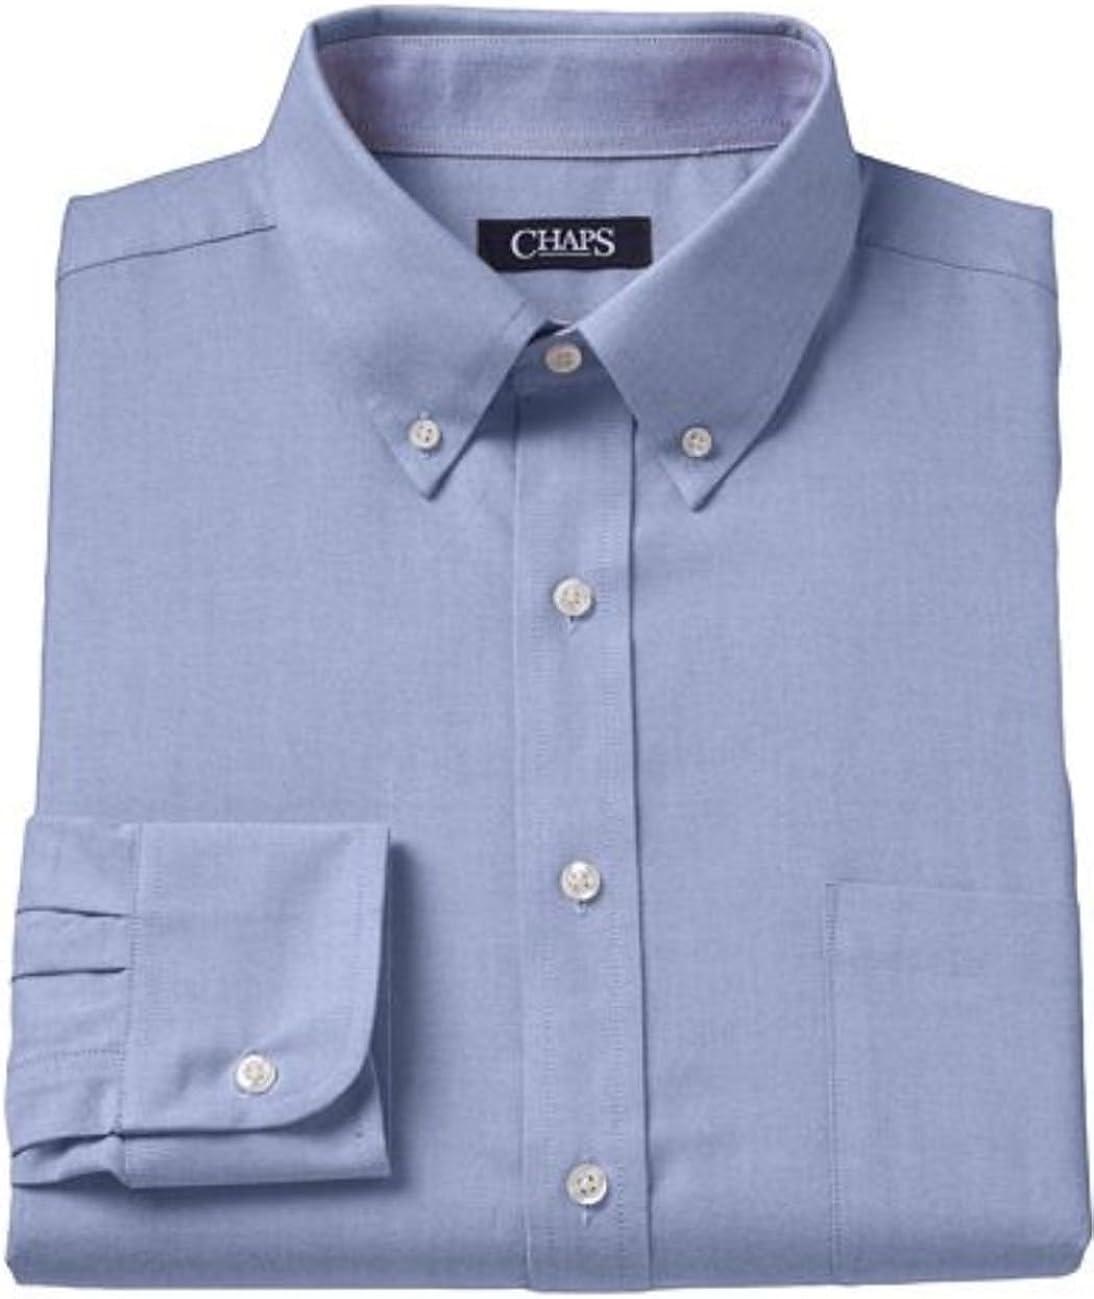 Chaps Men's Performance Classic-Fit Oxford Solid Dress Shirt